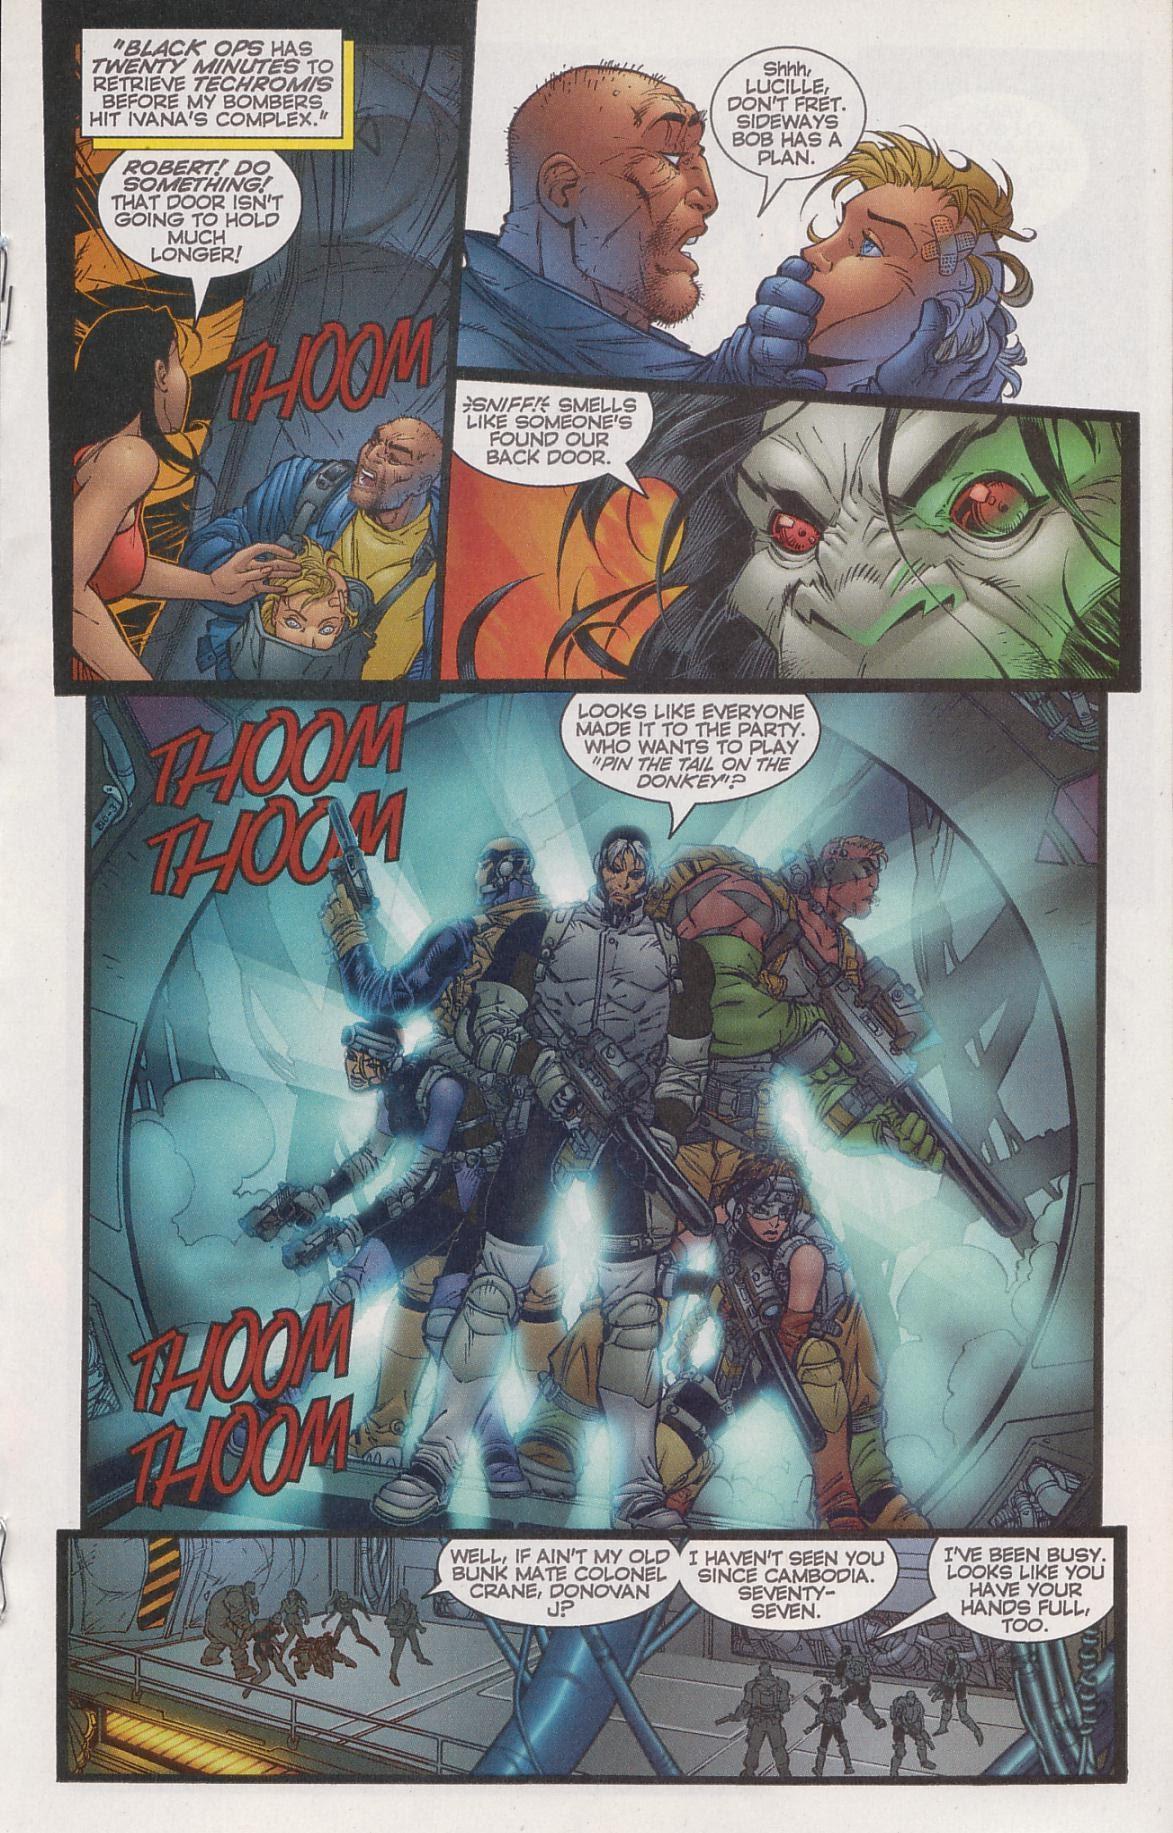 DV8 vs Black Ops Issue 3 | Viewcomic reading comics online for free 2019